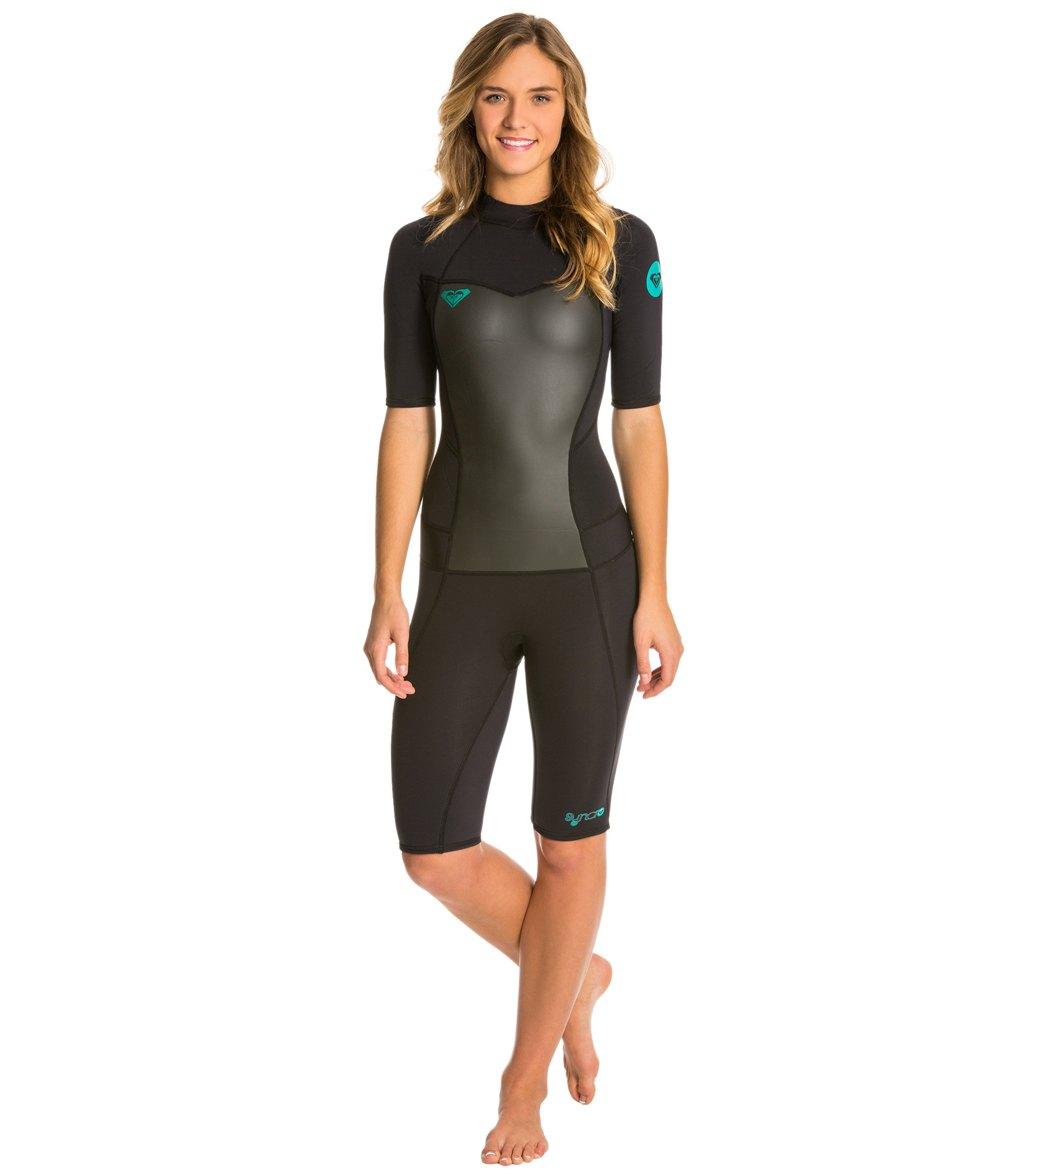 ... Women s 2MM Syncro Short Sleeve Back Zip Spring Suit Wetsuit Play  Video. MODEL MEASUREMENTS 4c0fca9f3